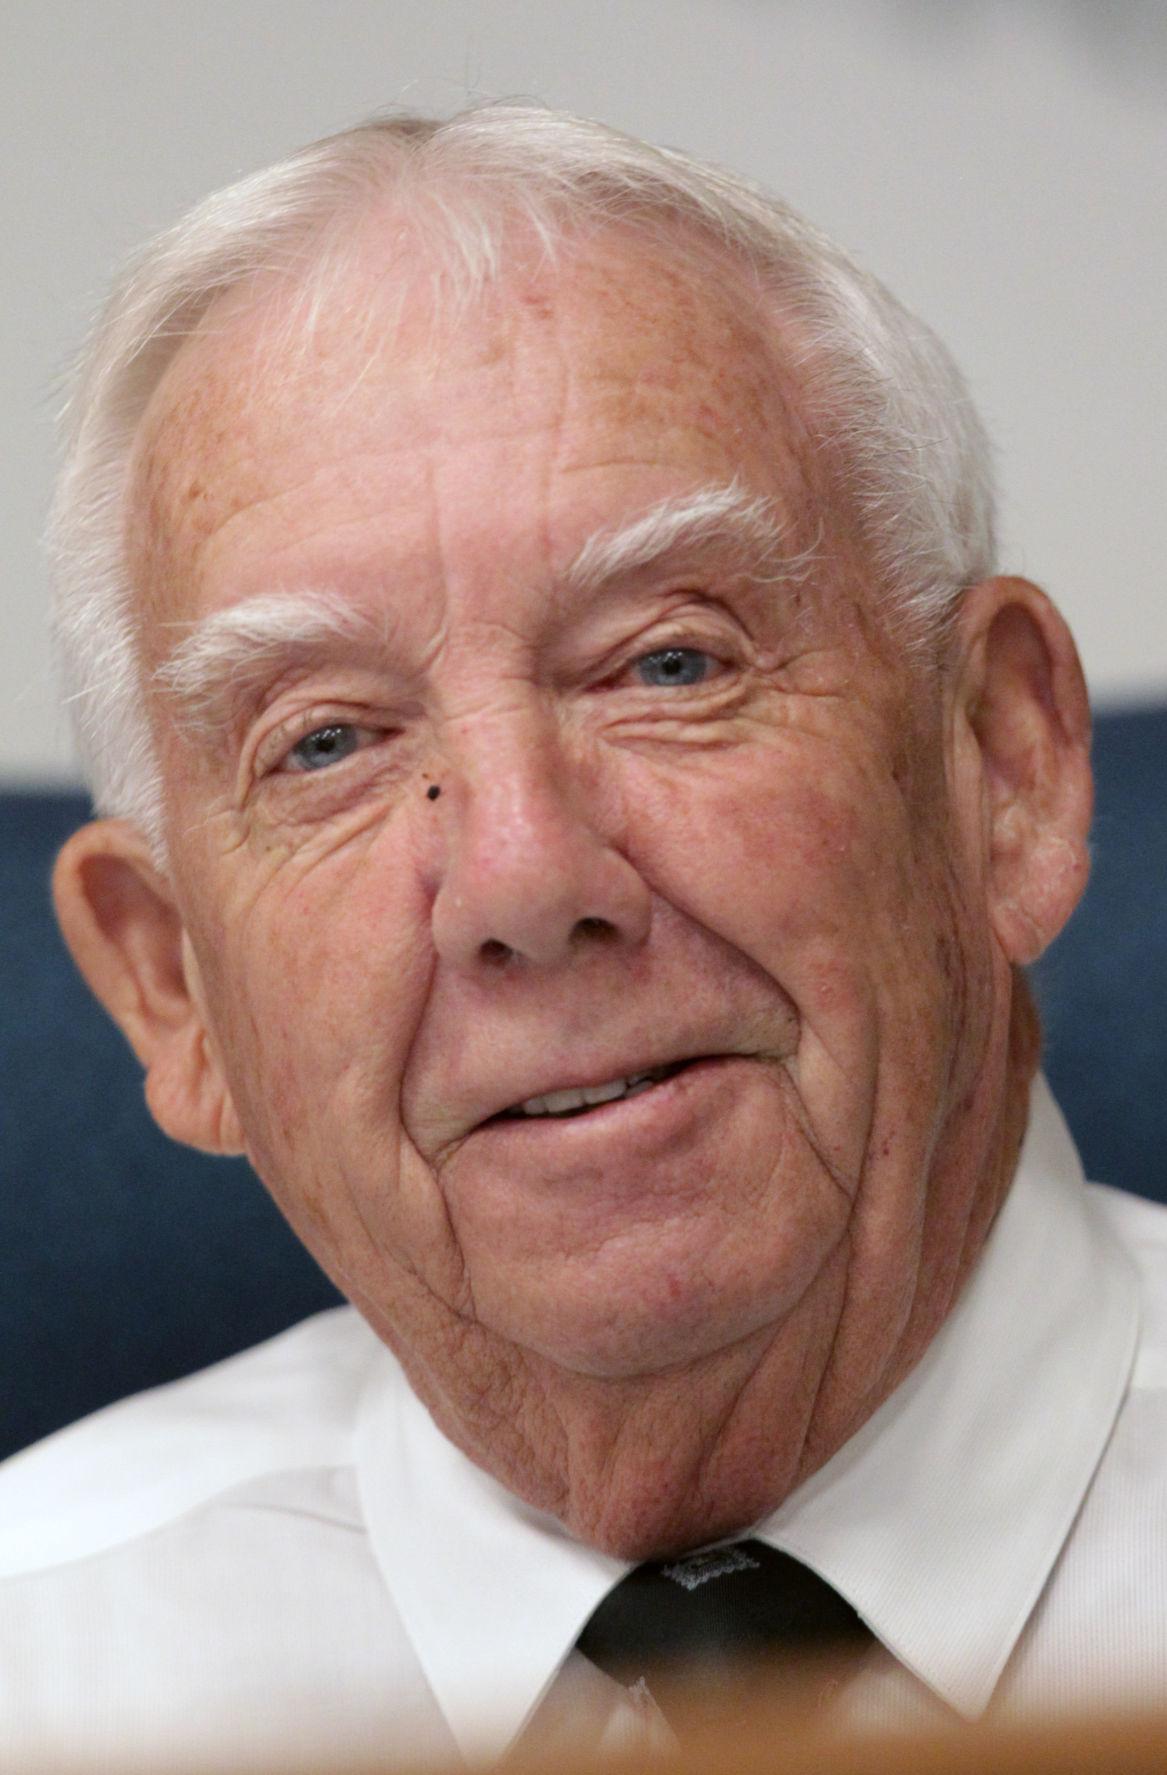 Vice Mayor Harold Hanson